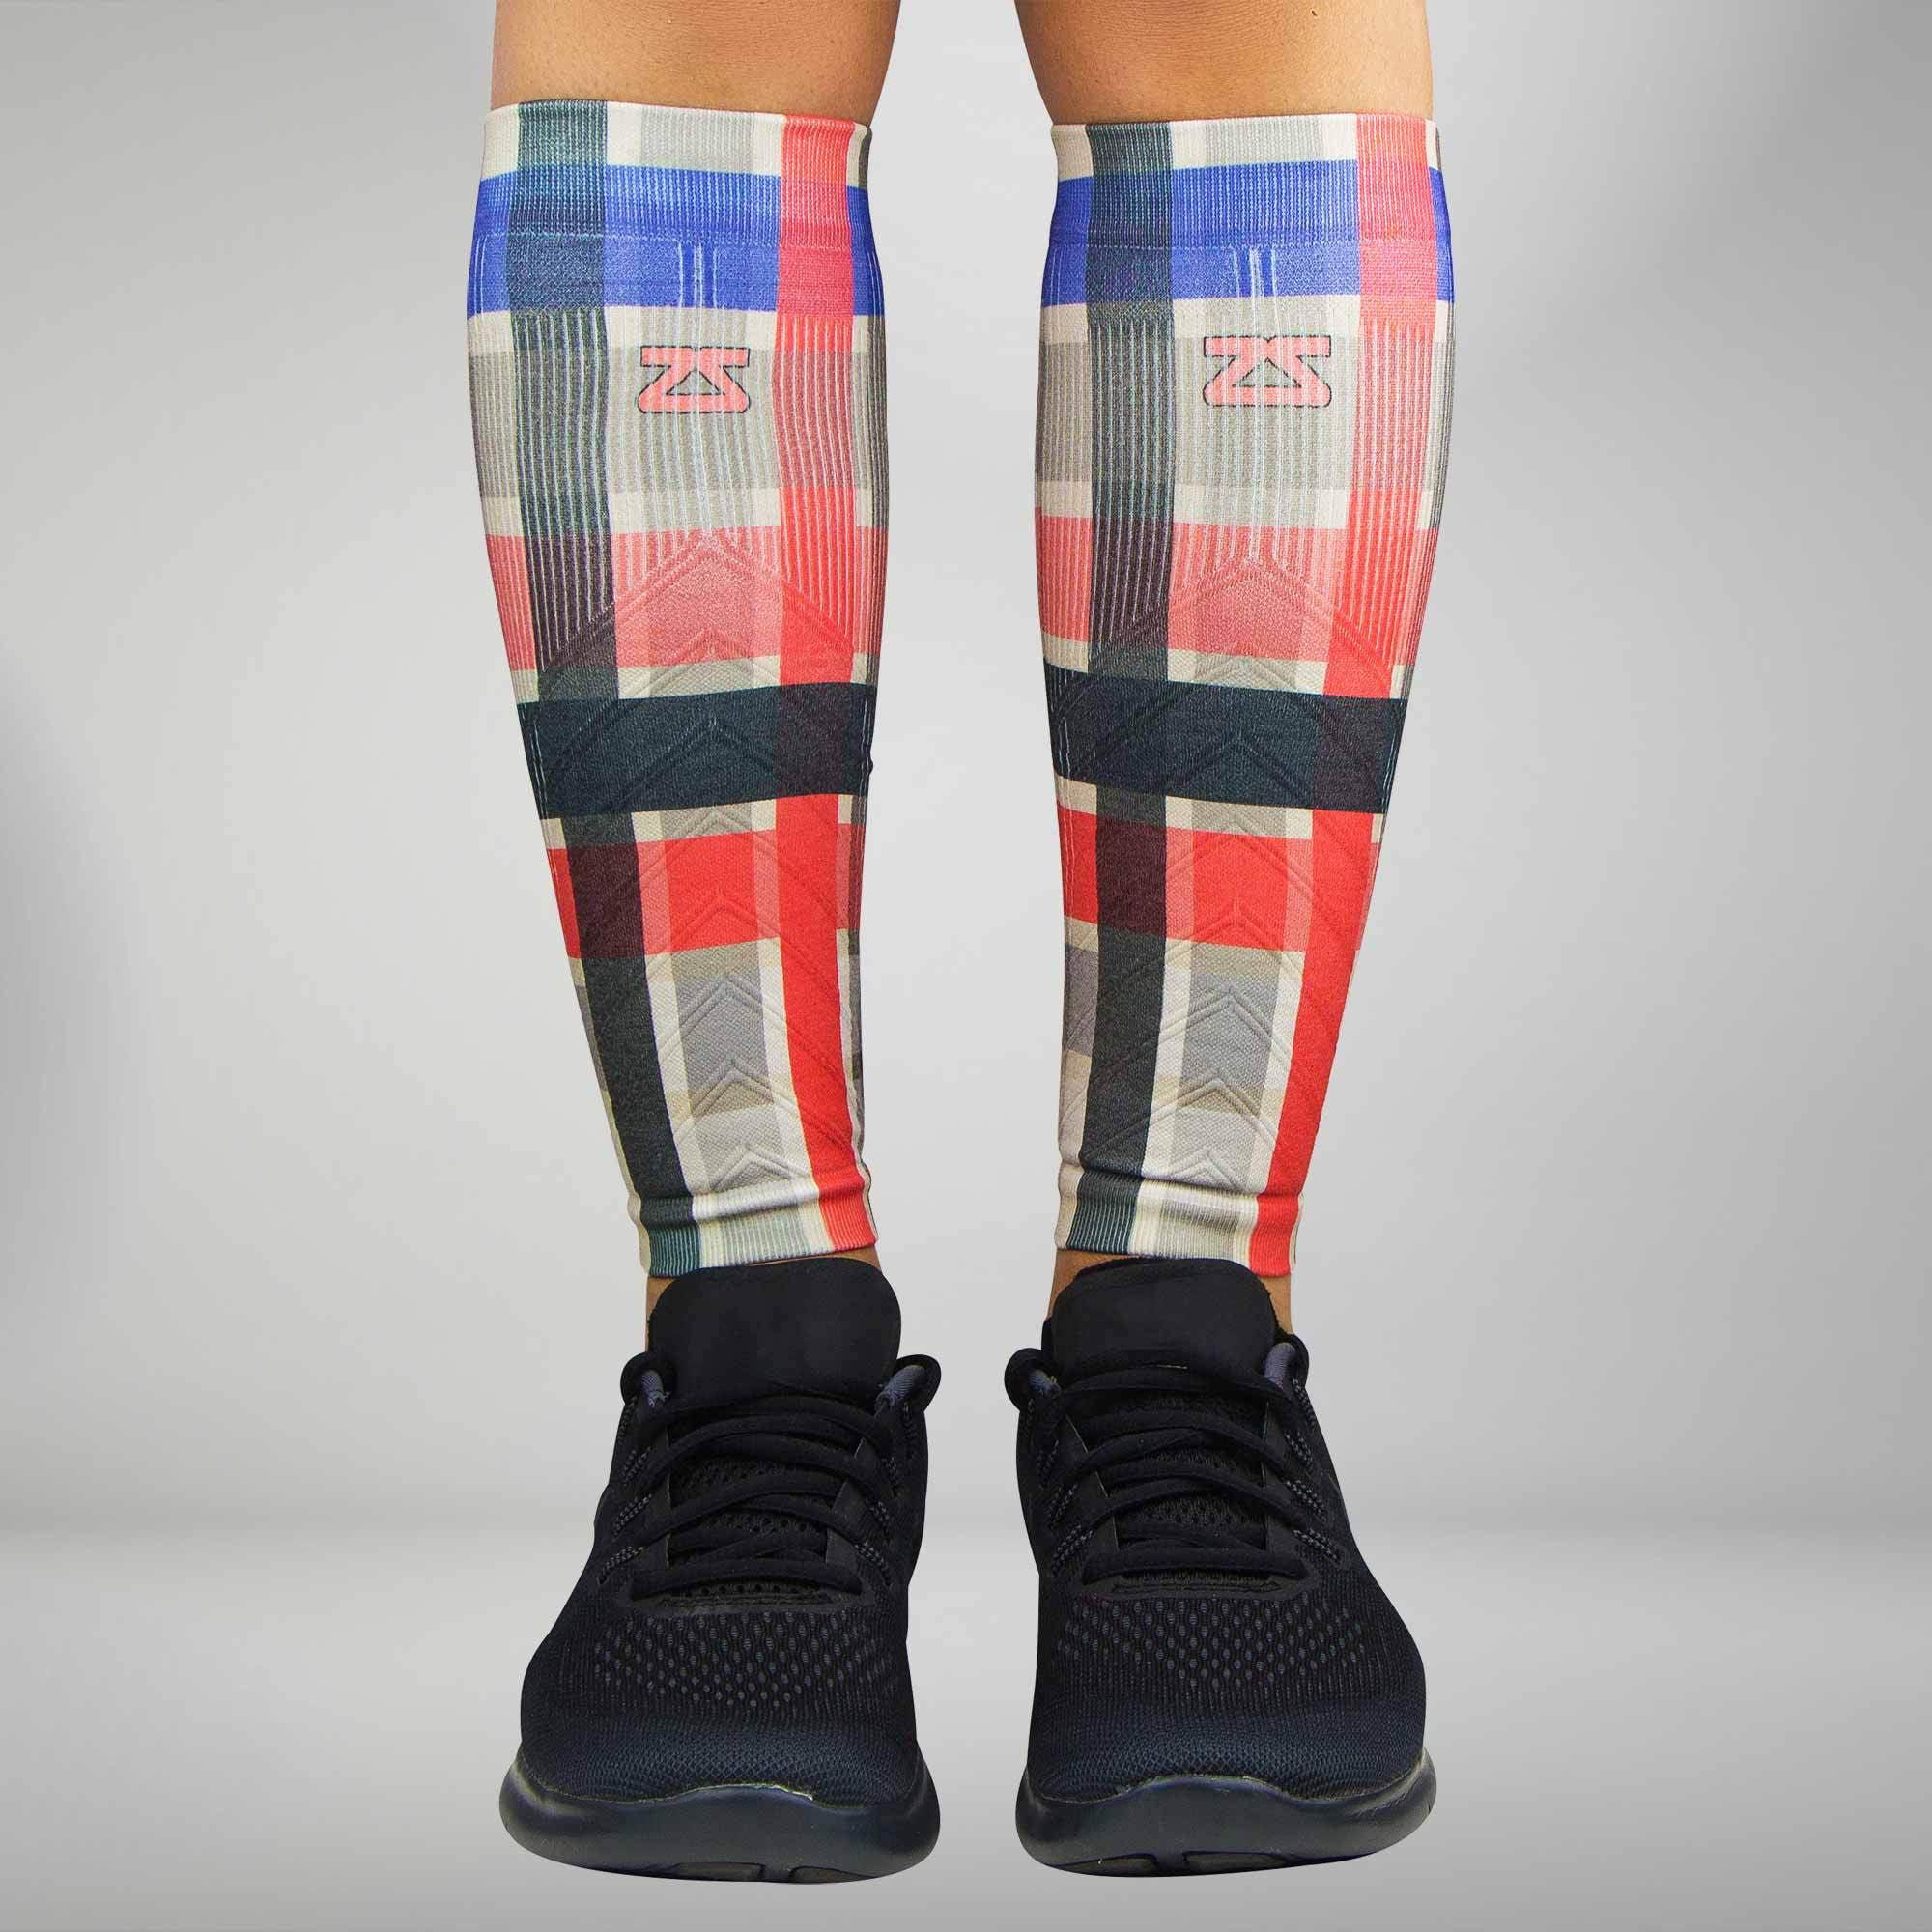 Plaid Compression Leg Sleeves XS/S / Grey-Tan-Red